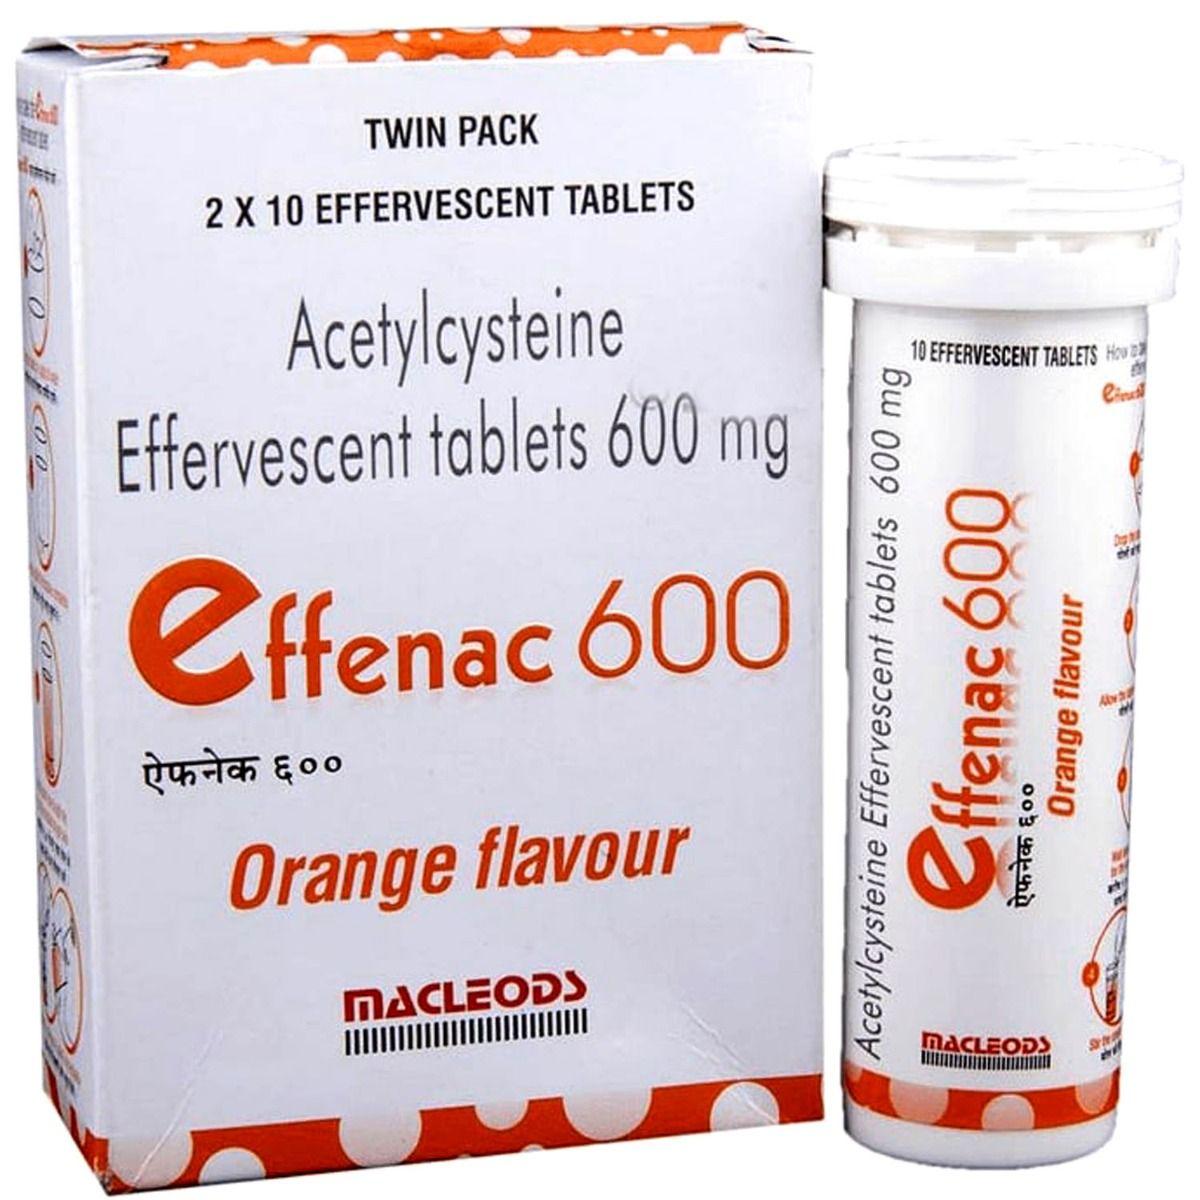 Effenac 600 Orange Effervescent Tablet 10's